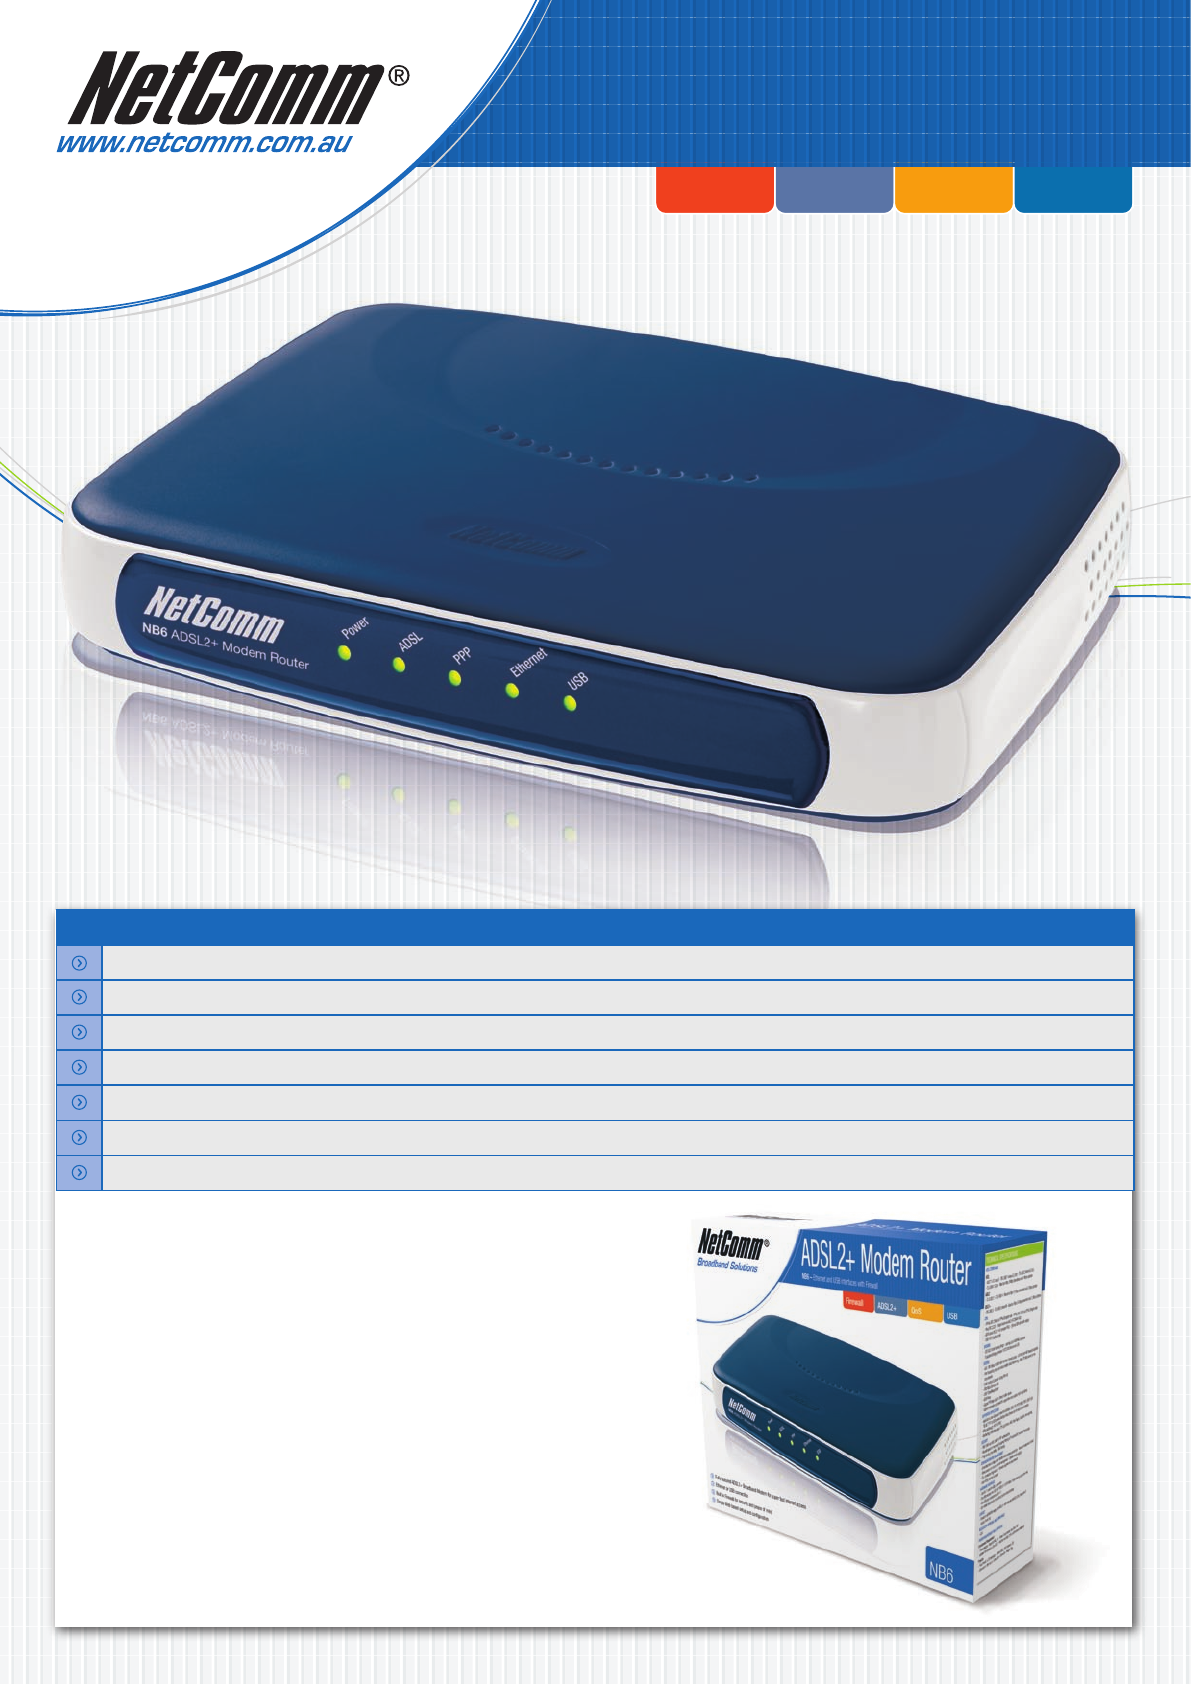 netcomm nb6 firmware